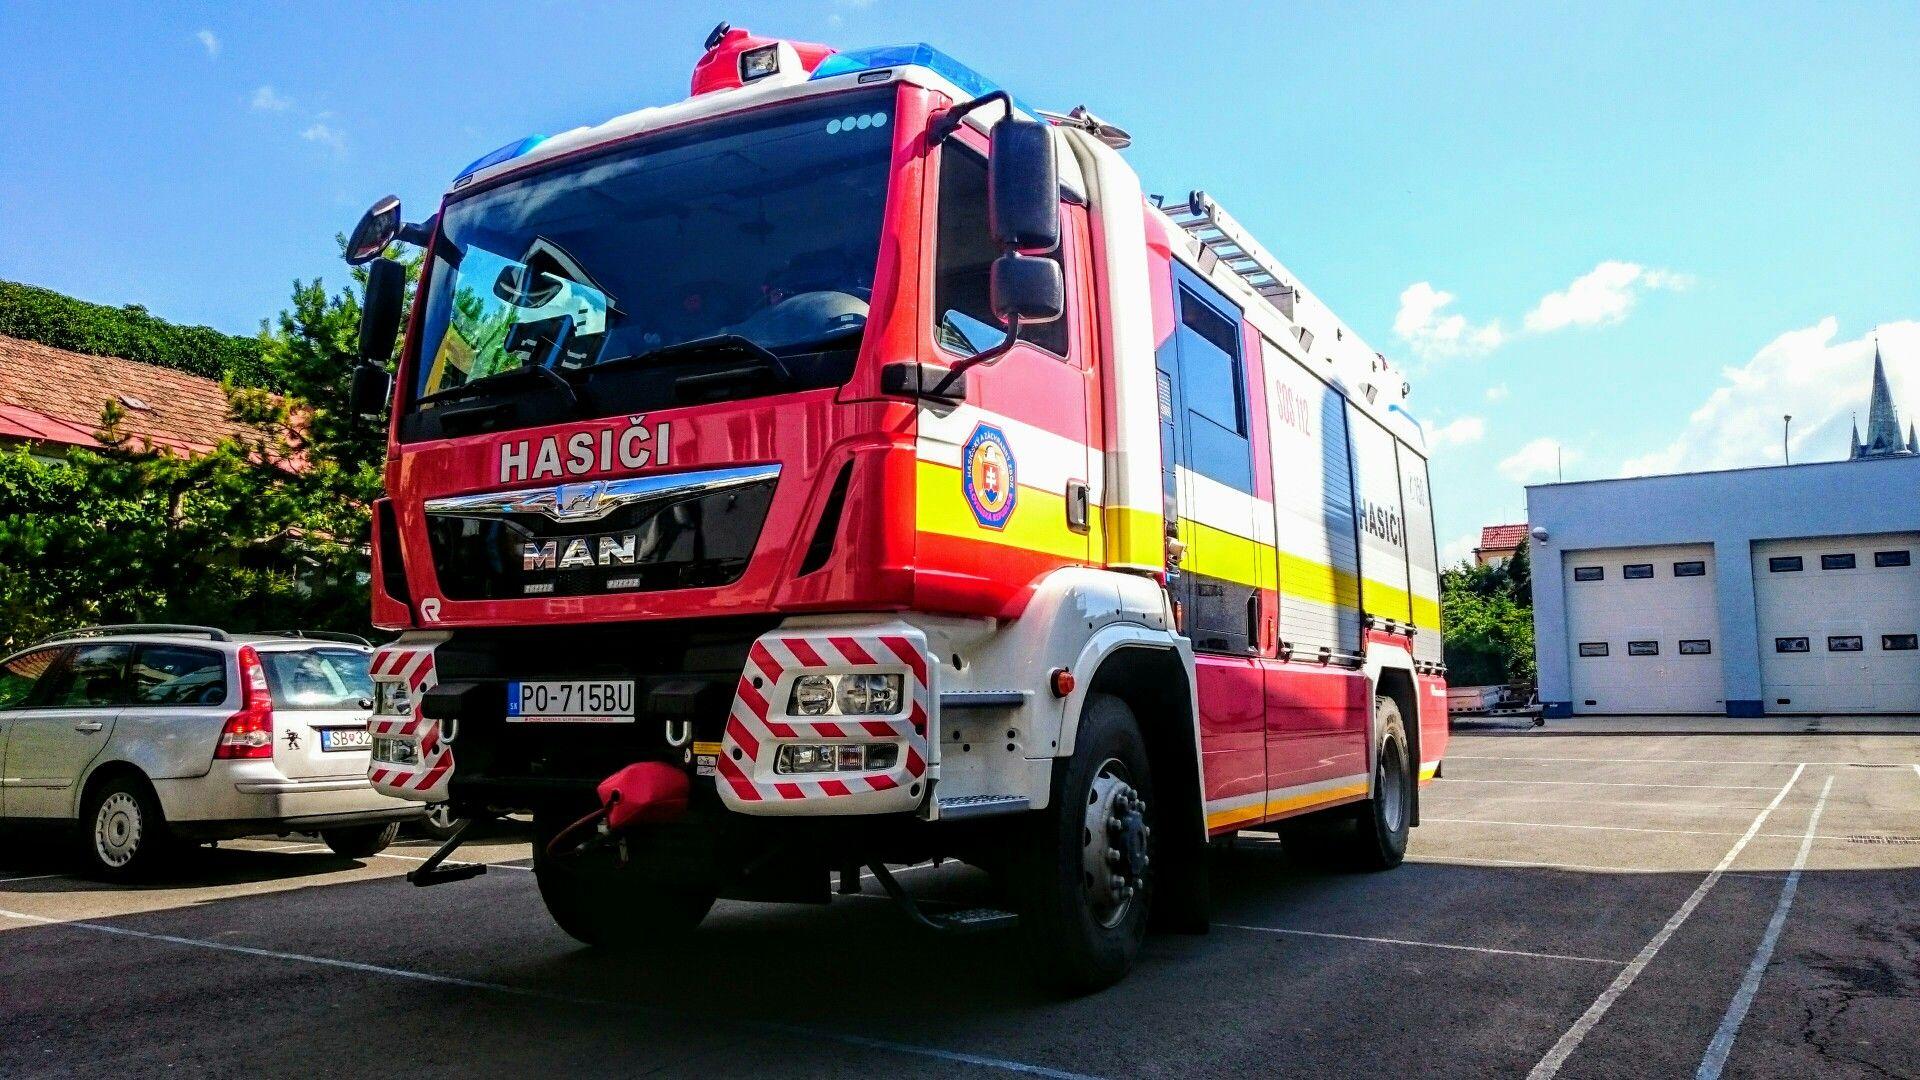 Pin Em Fire Rescue Police Cars Truck